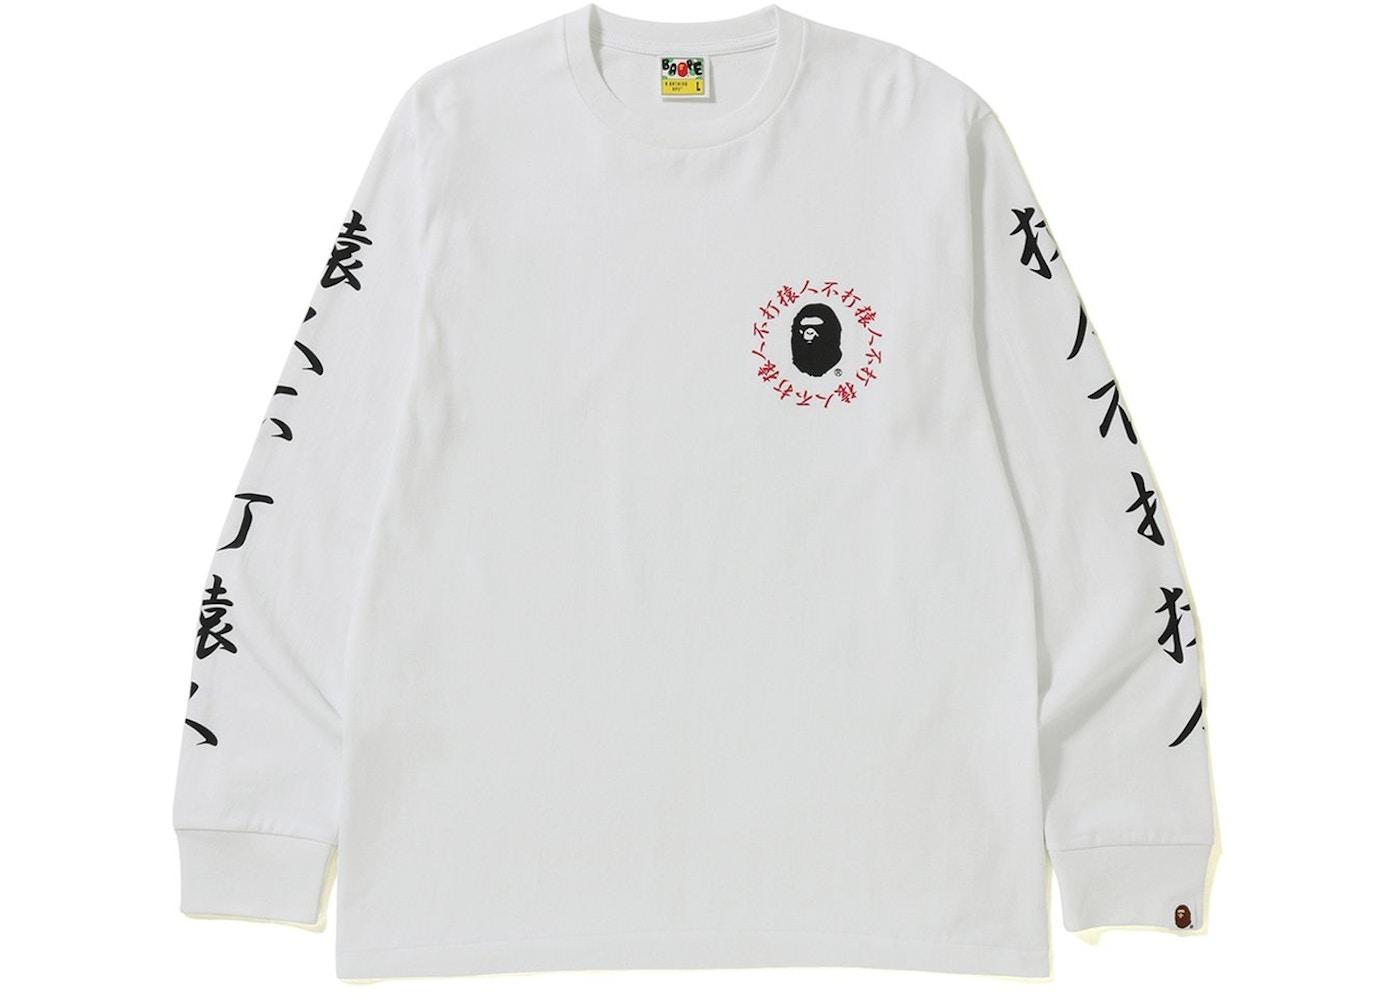 0c51b1800 BAPE Kanji Logo Long Sleeve Tee White - FW18